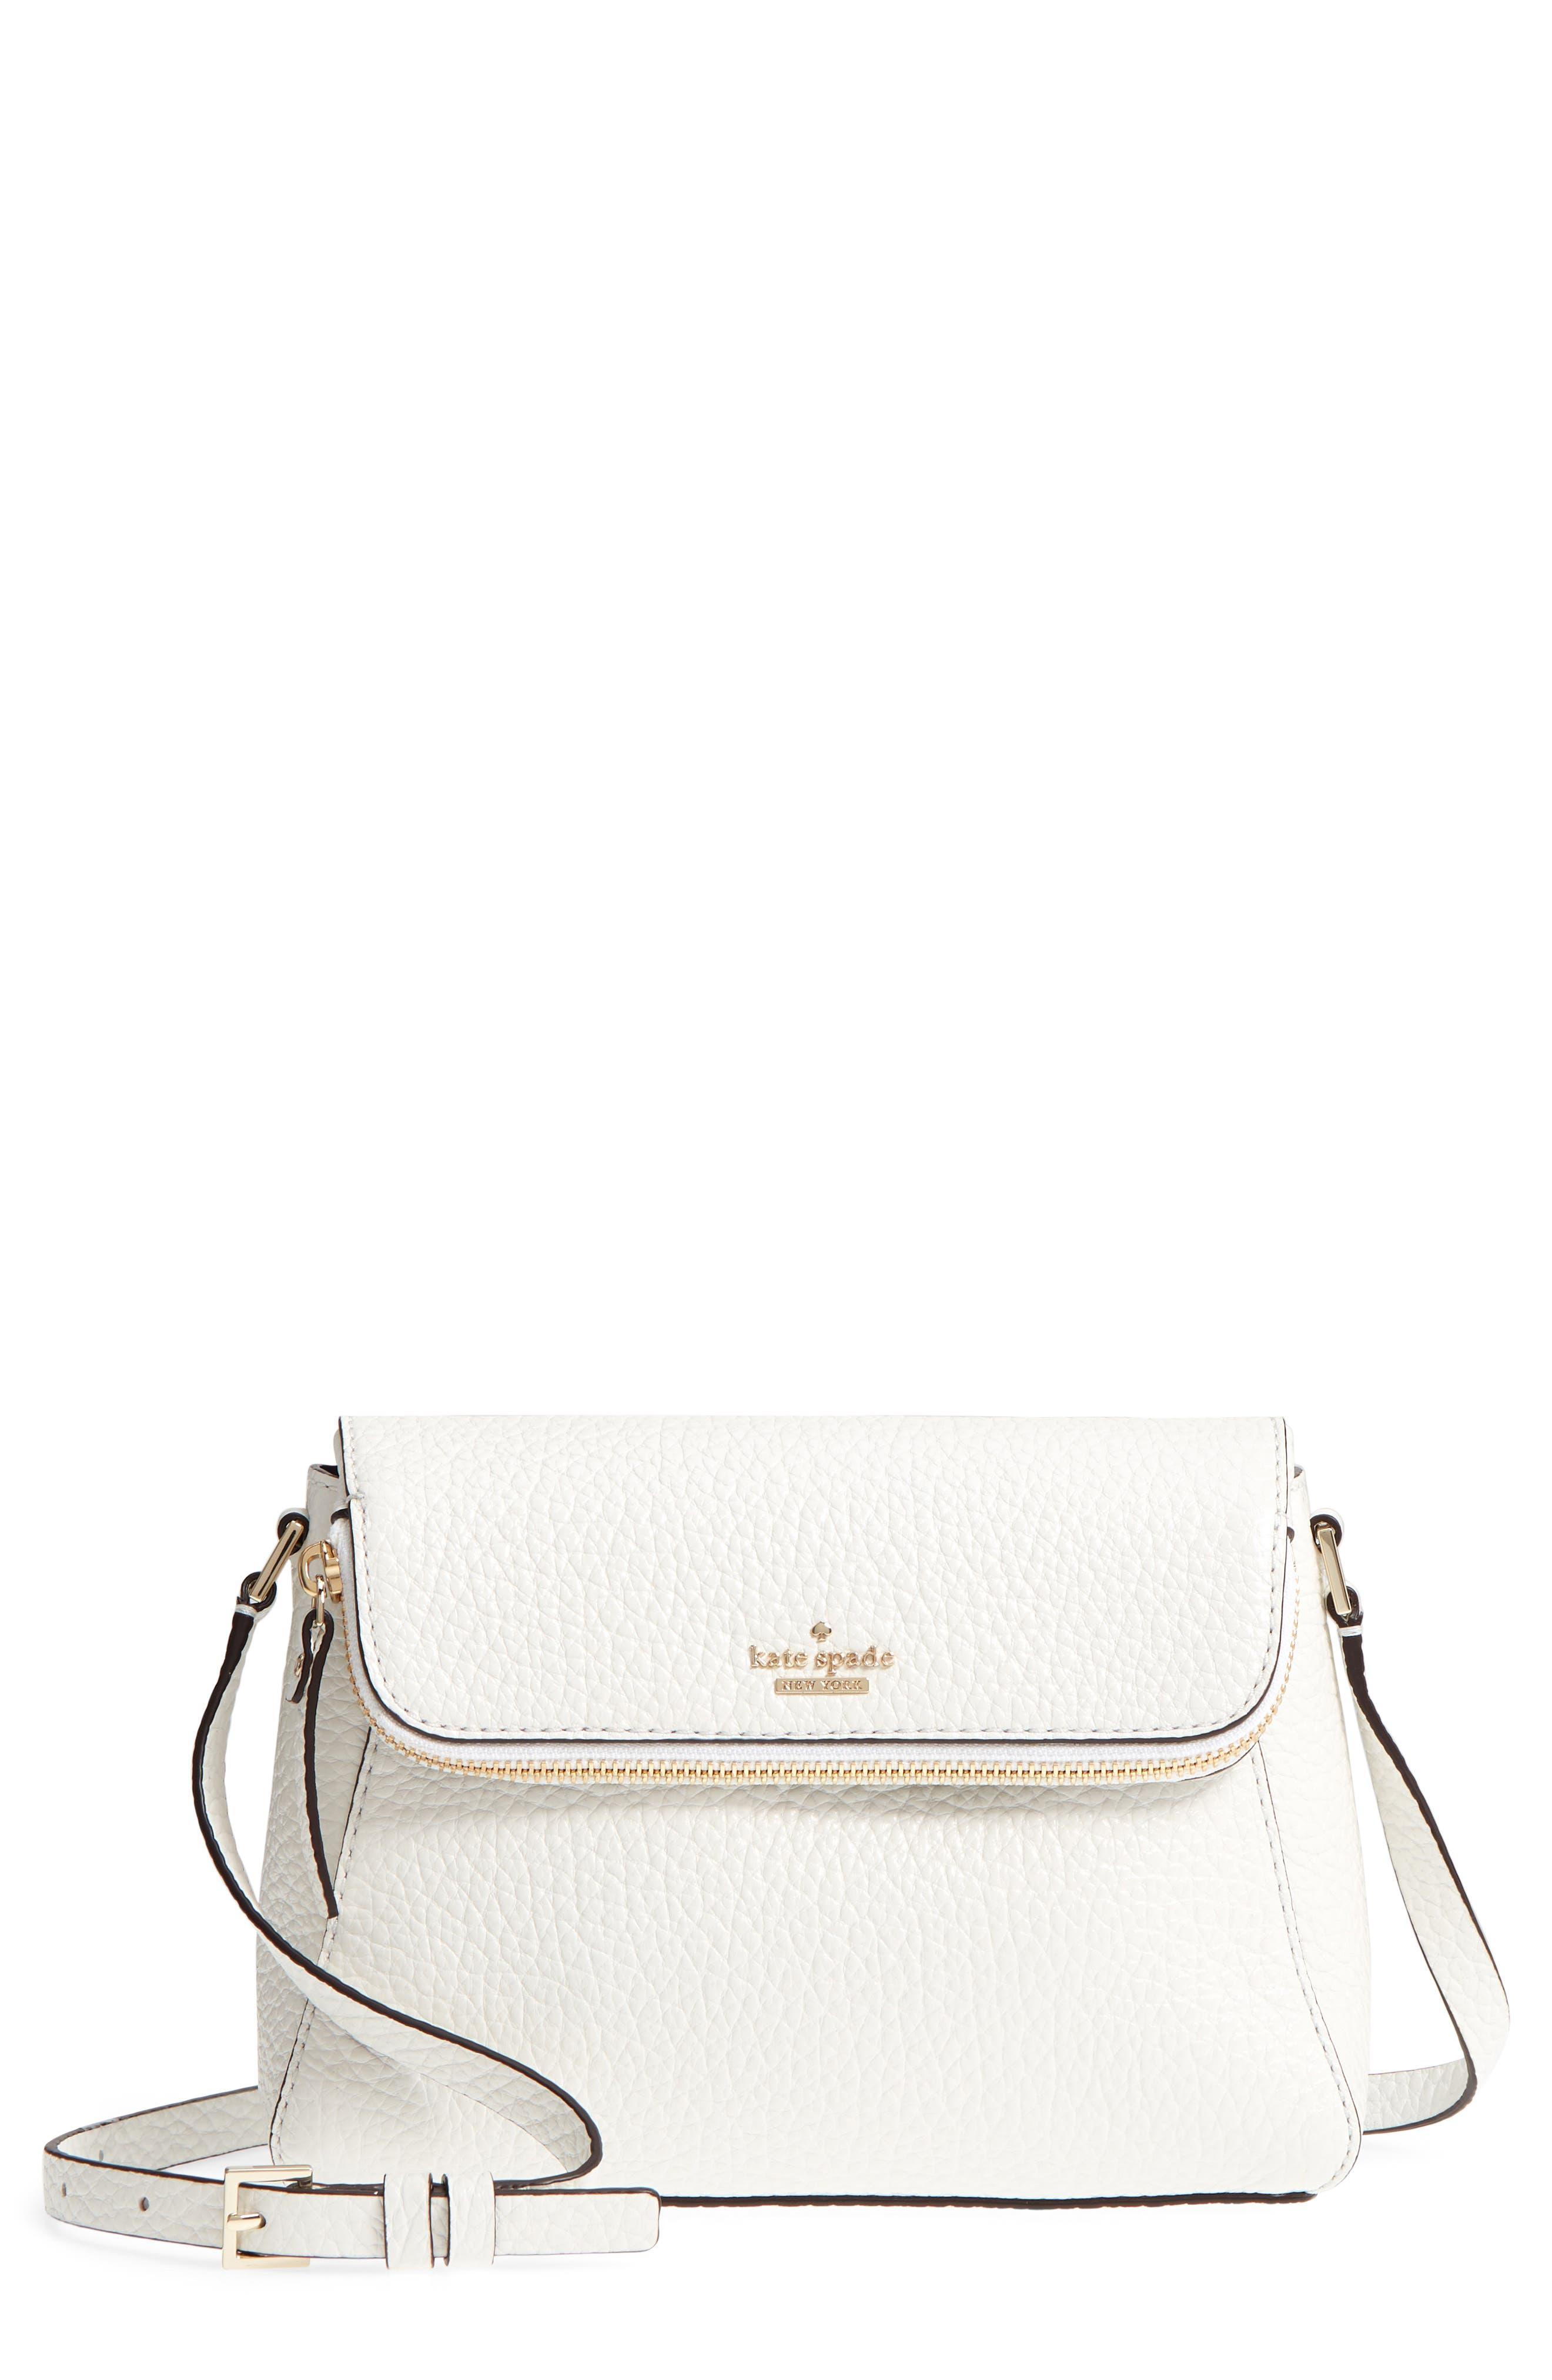 carter street - berrin leather crossbody bag,                             Main thumbnail 1, color,                             Bright White